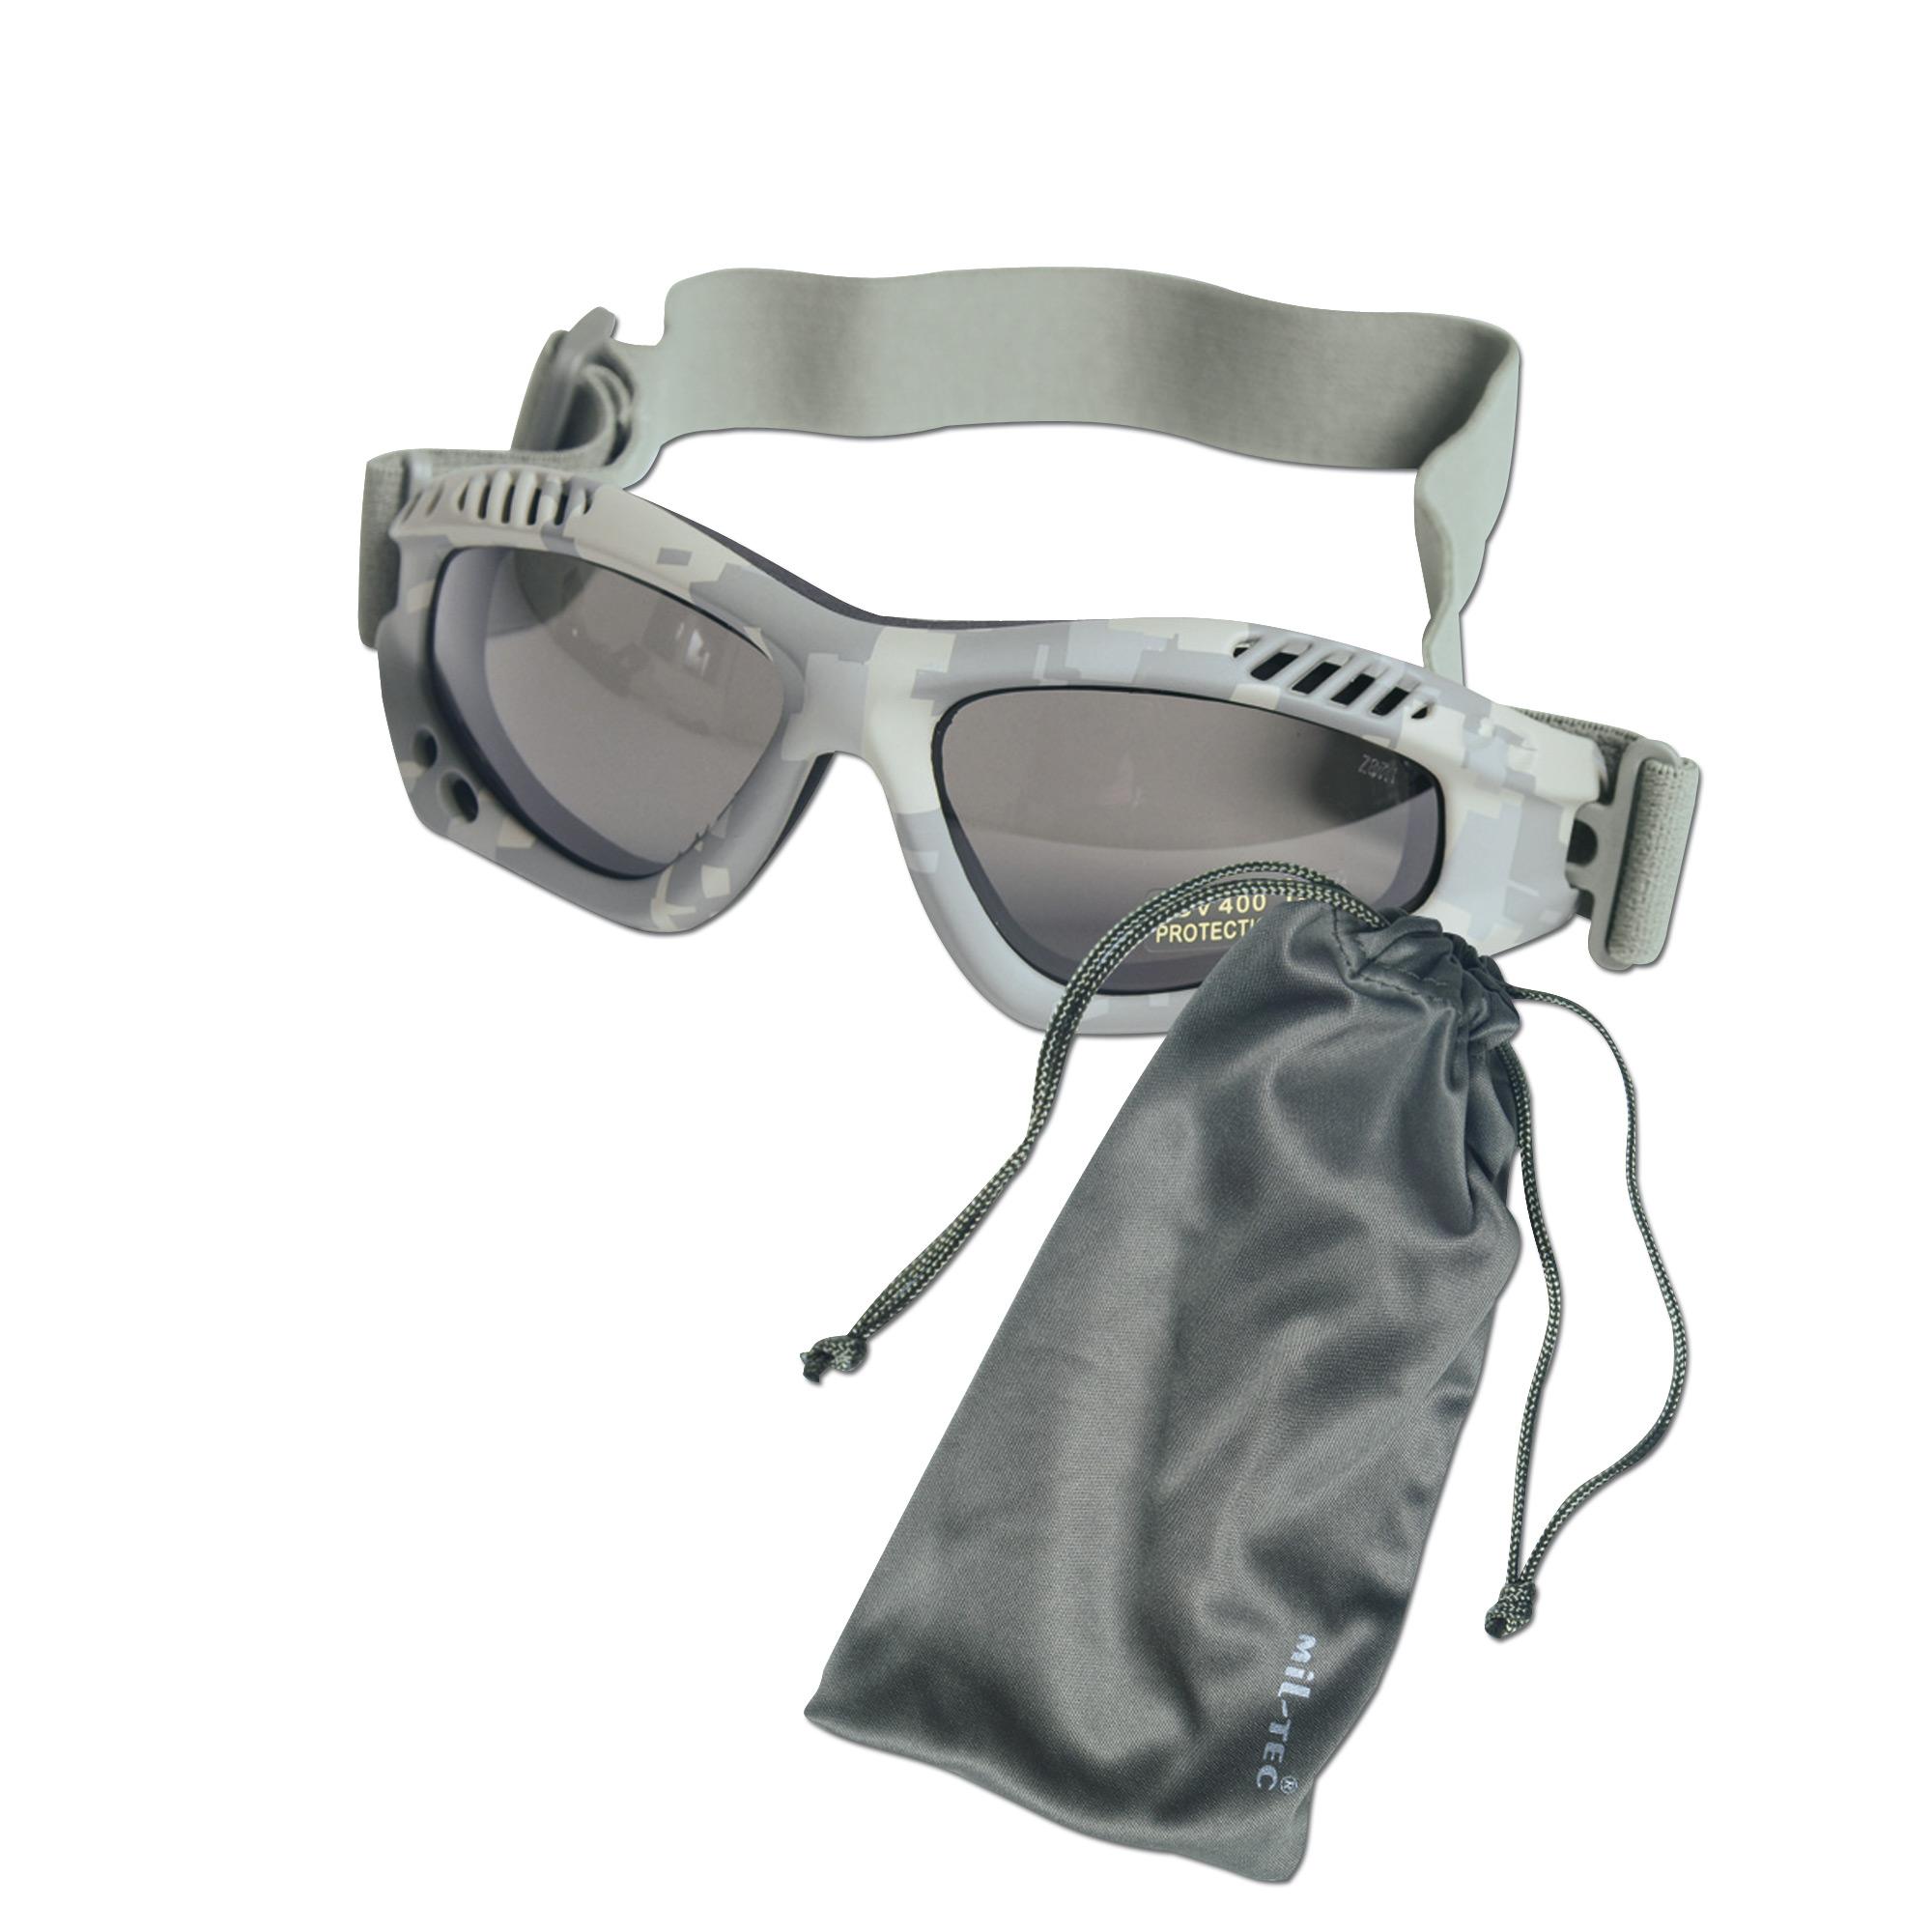 Masque de protection Commando Air-Pro AT-digital smoke